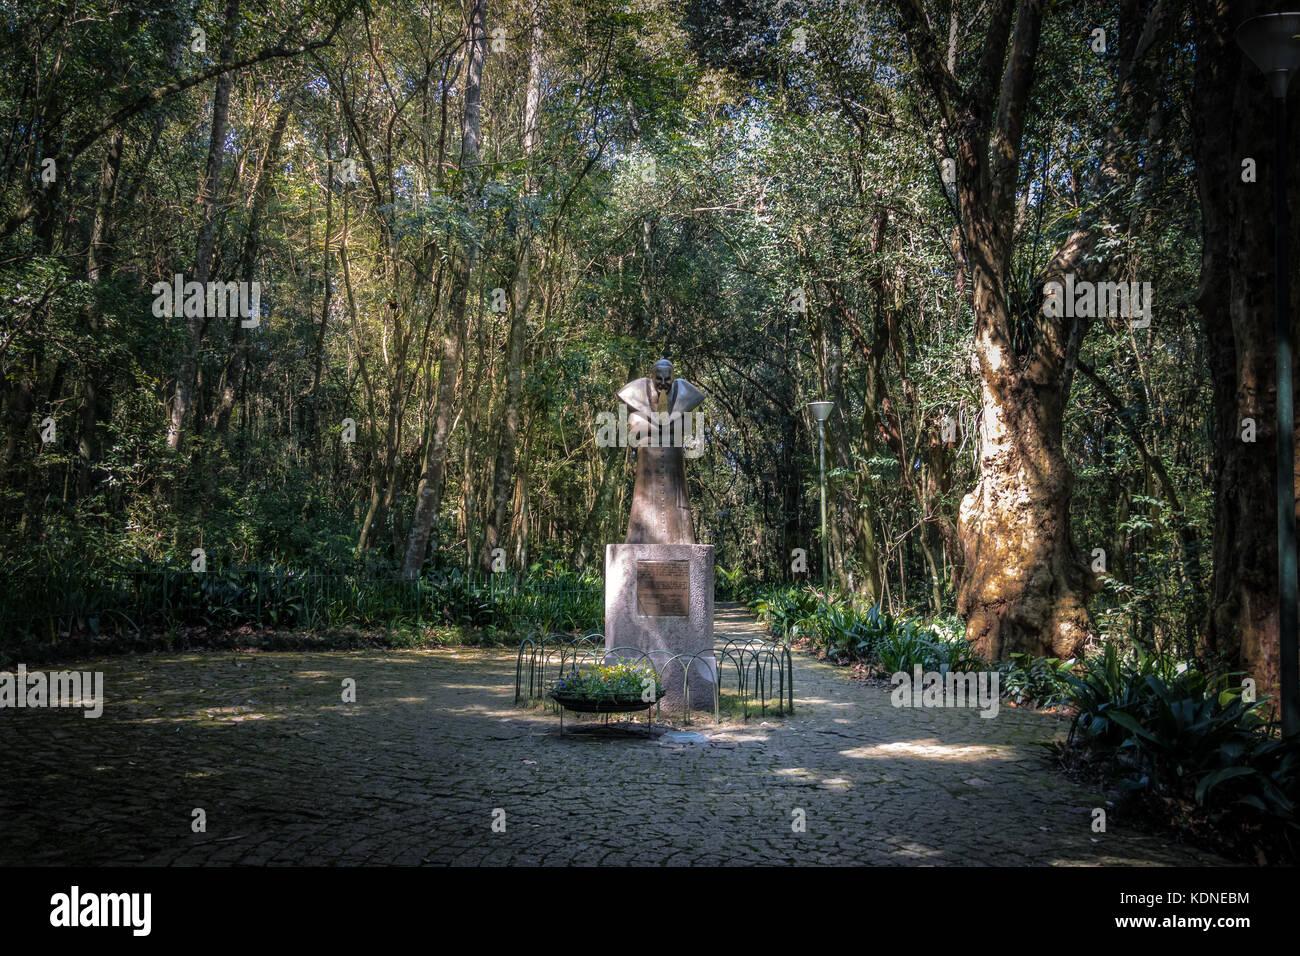 Statue de Jean Paul II à bosque do papa du pape (bois) - Curitiba, Parana, Brésil Photo Stock